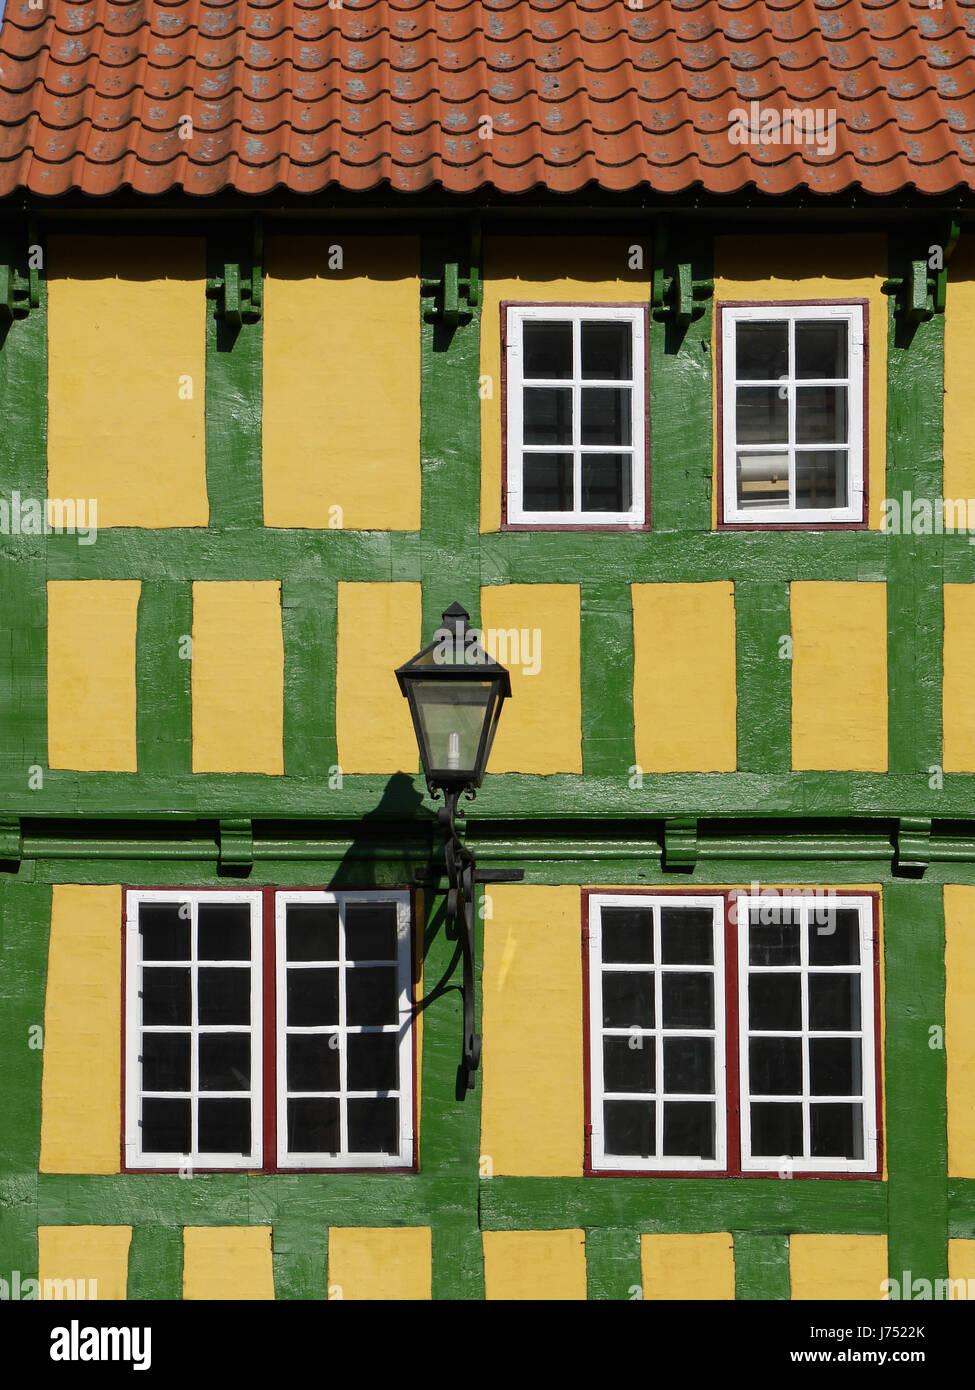 facade lantern old building restores house building historical green frame-work Stock Photo